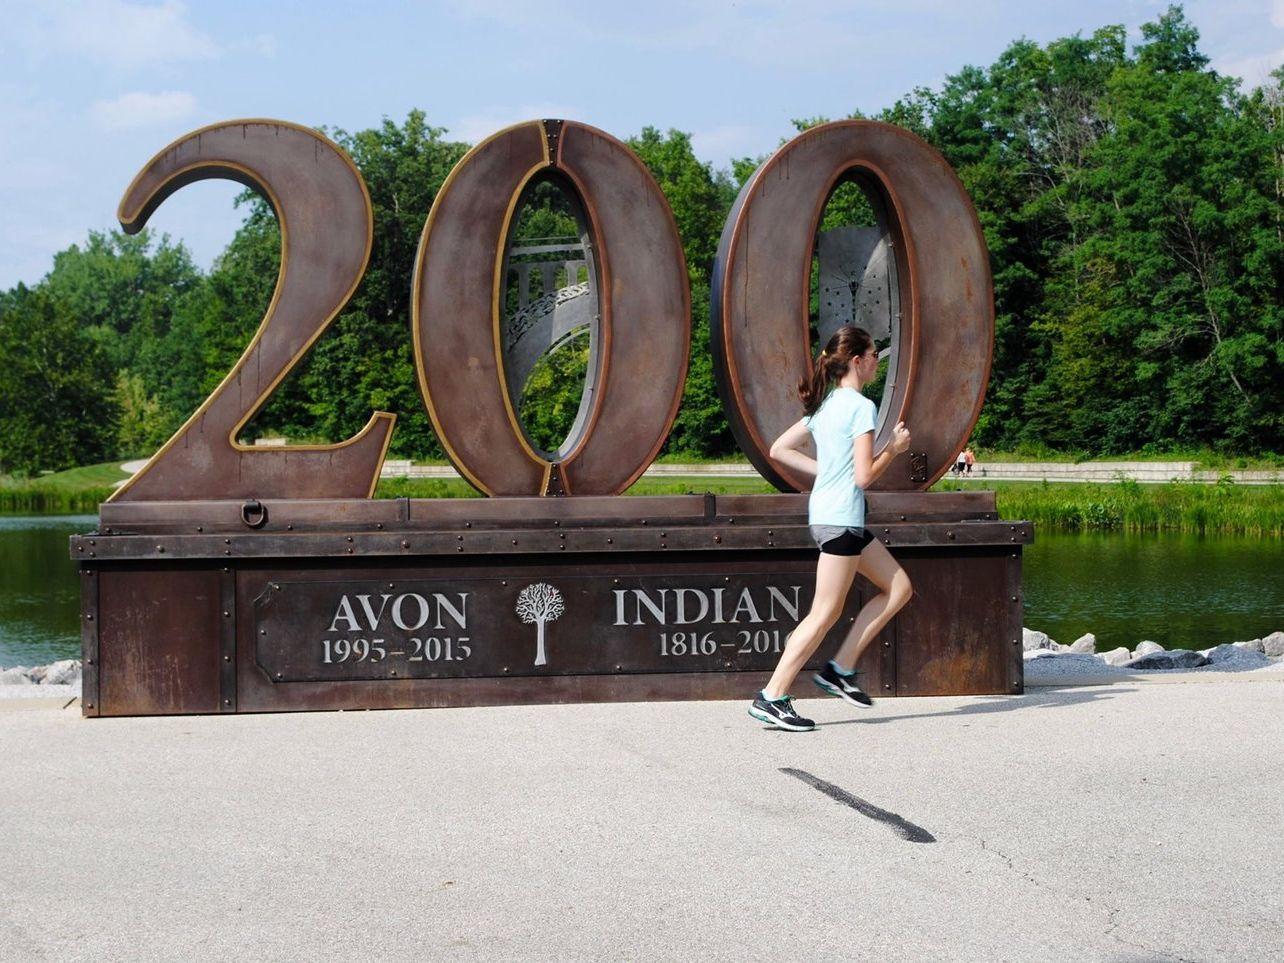 Avon - Coming Soon!